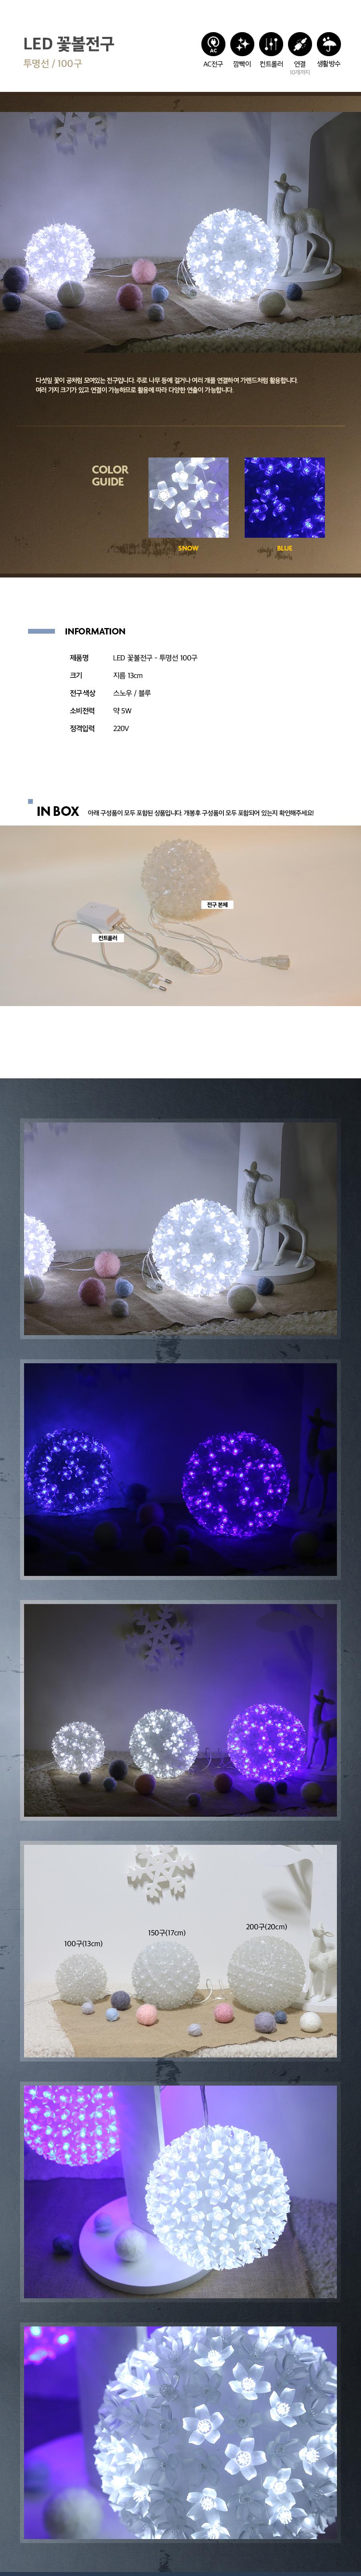 Hm1113 LED모빌 17cm꽃볼전구 150구 무드등 트리전구 - 메리트리, 34,700원, 조명, 크리스마스조명